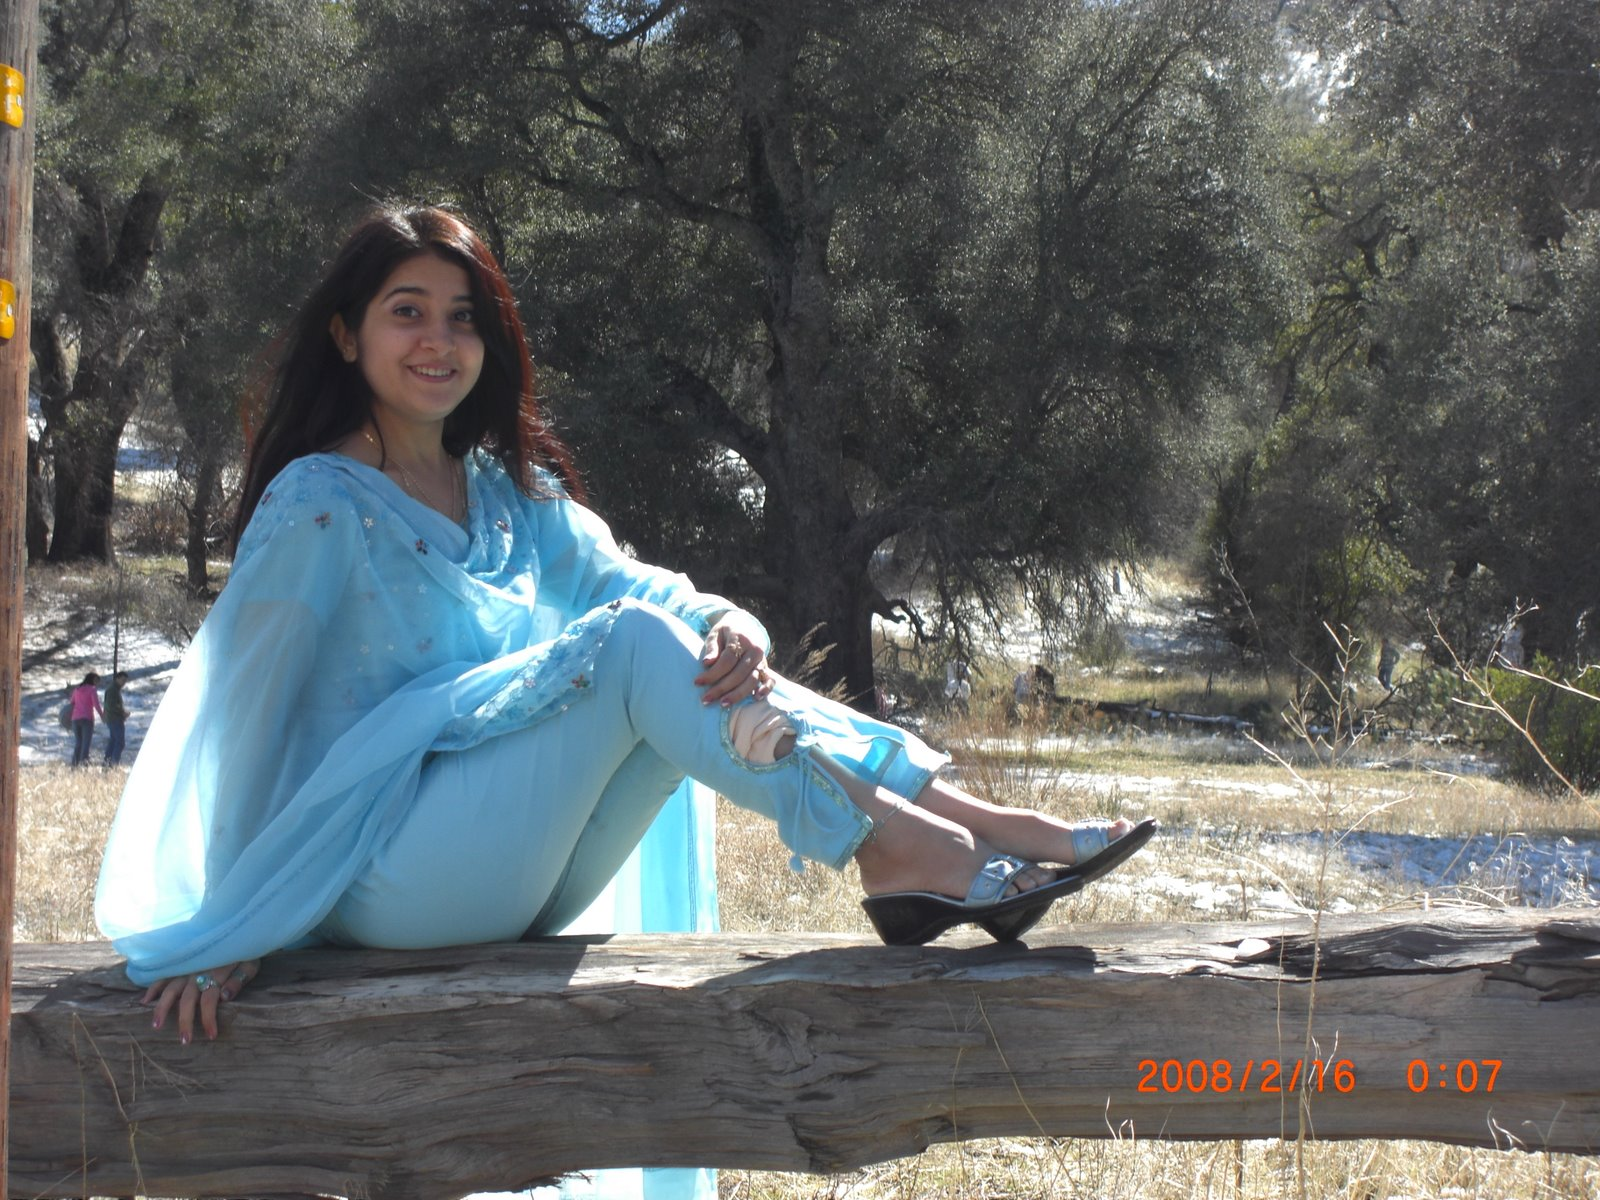 http://3.bp.blogspot.com/-GhmUA6OZSh0/Tc5EjZDvPOI/AAAAAAAAHLI/_rV8dGBl-3w/s1600/Indian+Models+%2528159%2529.jpg